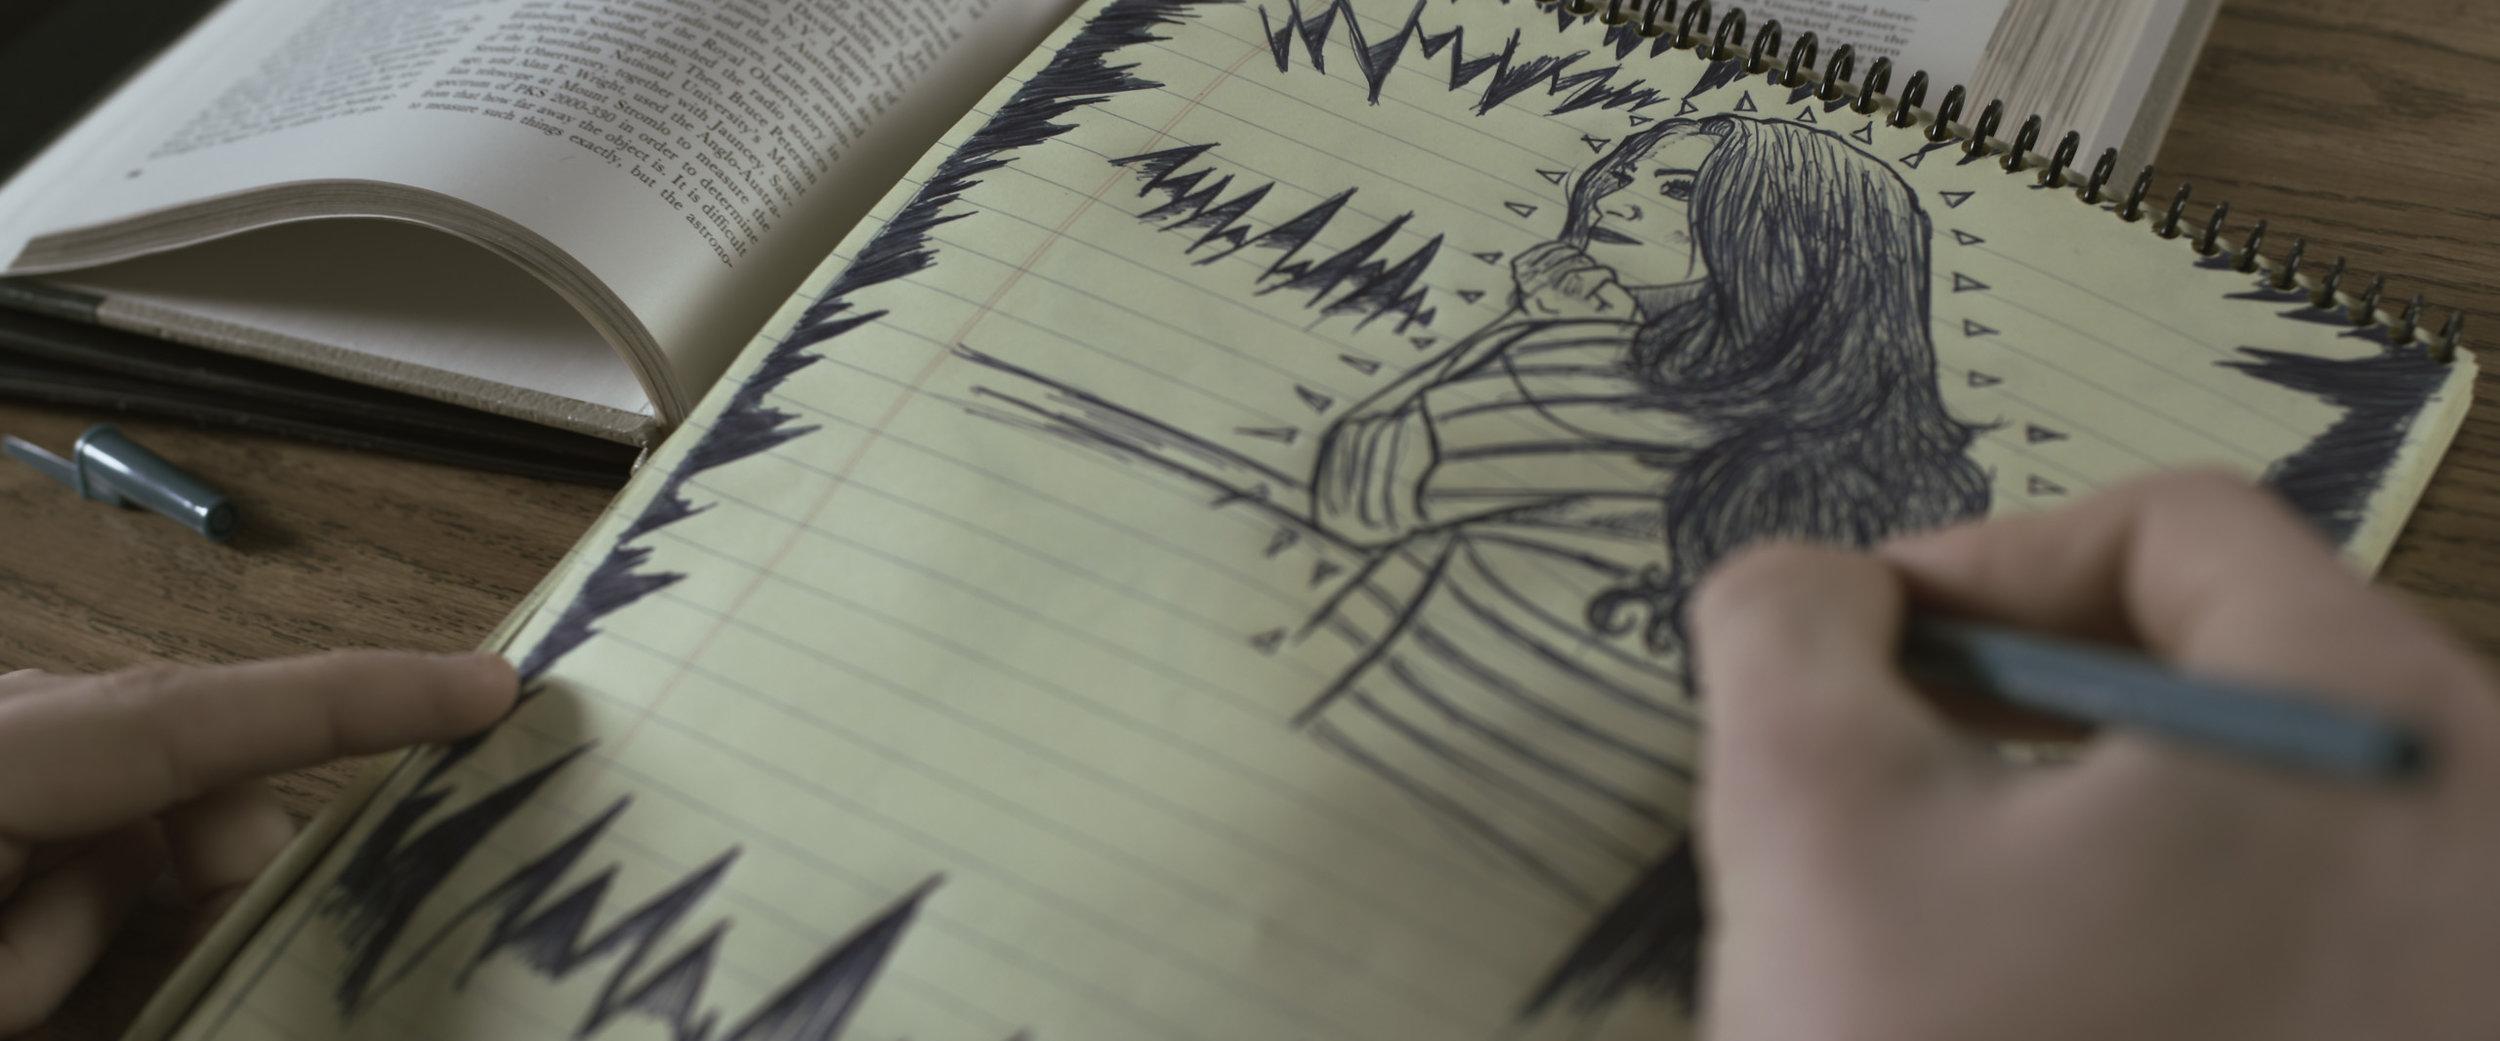 drawings by Ben Deka